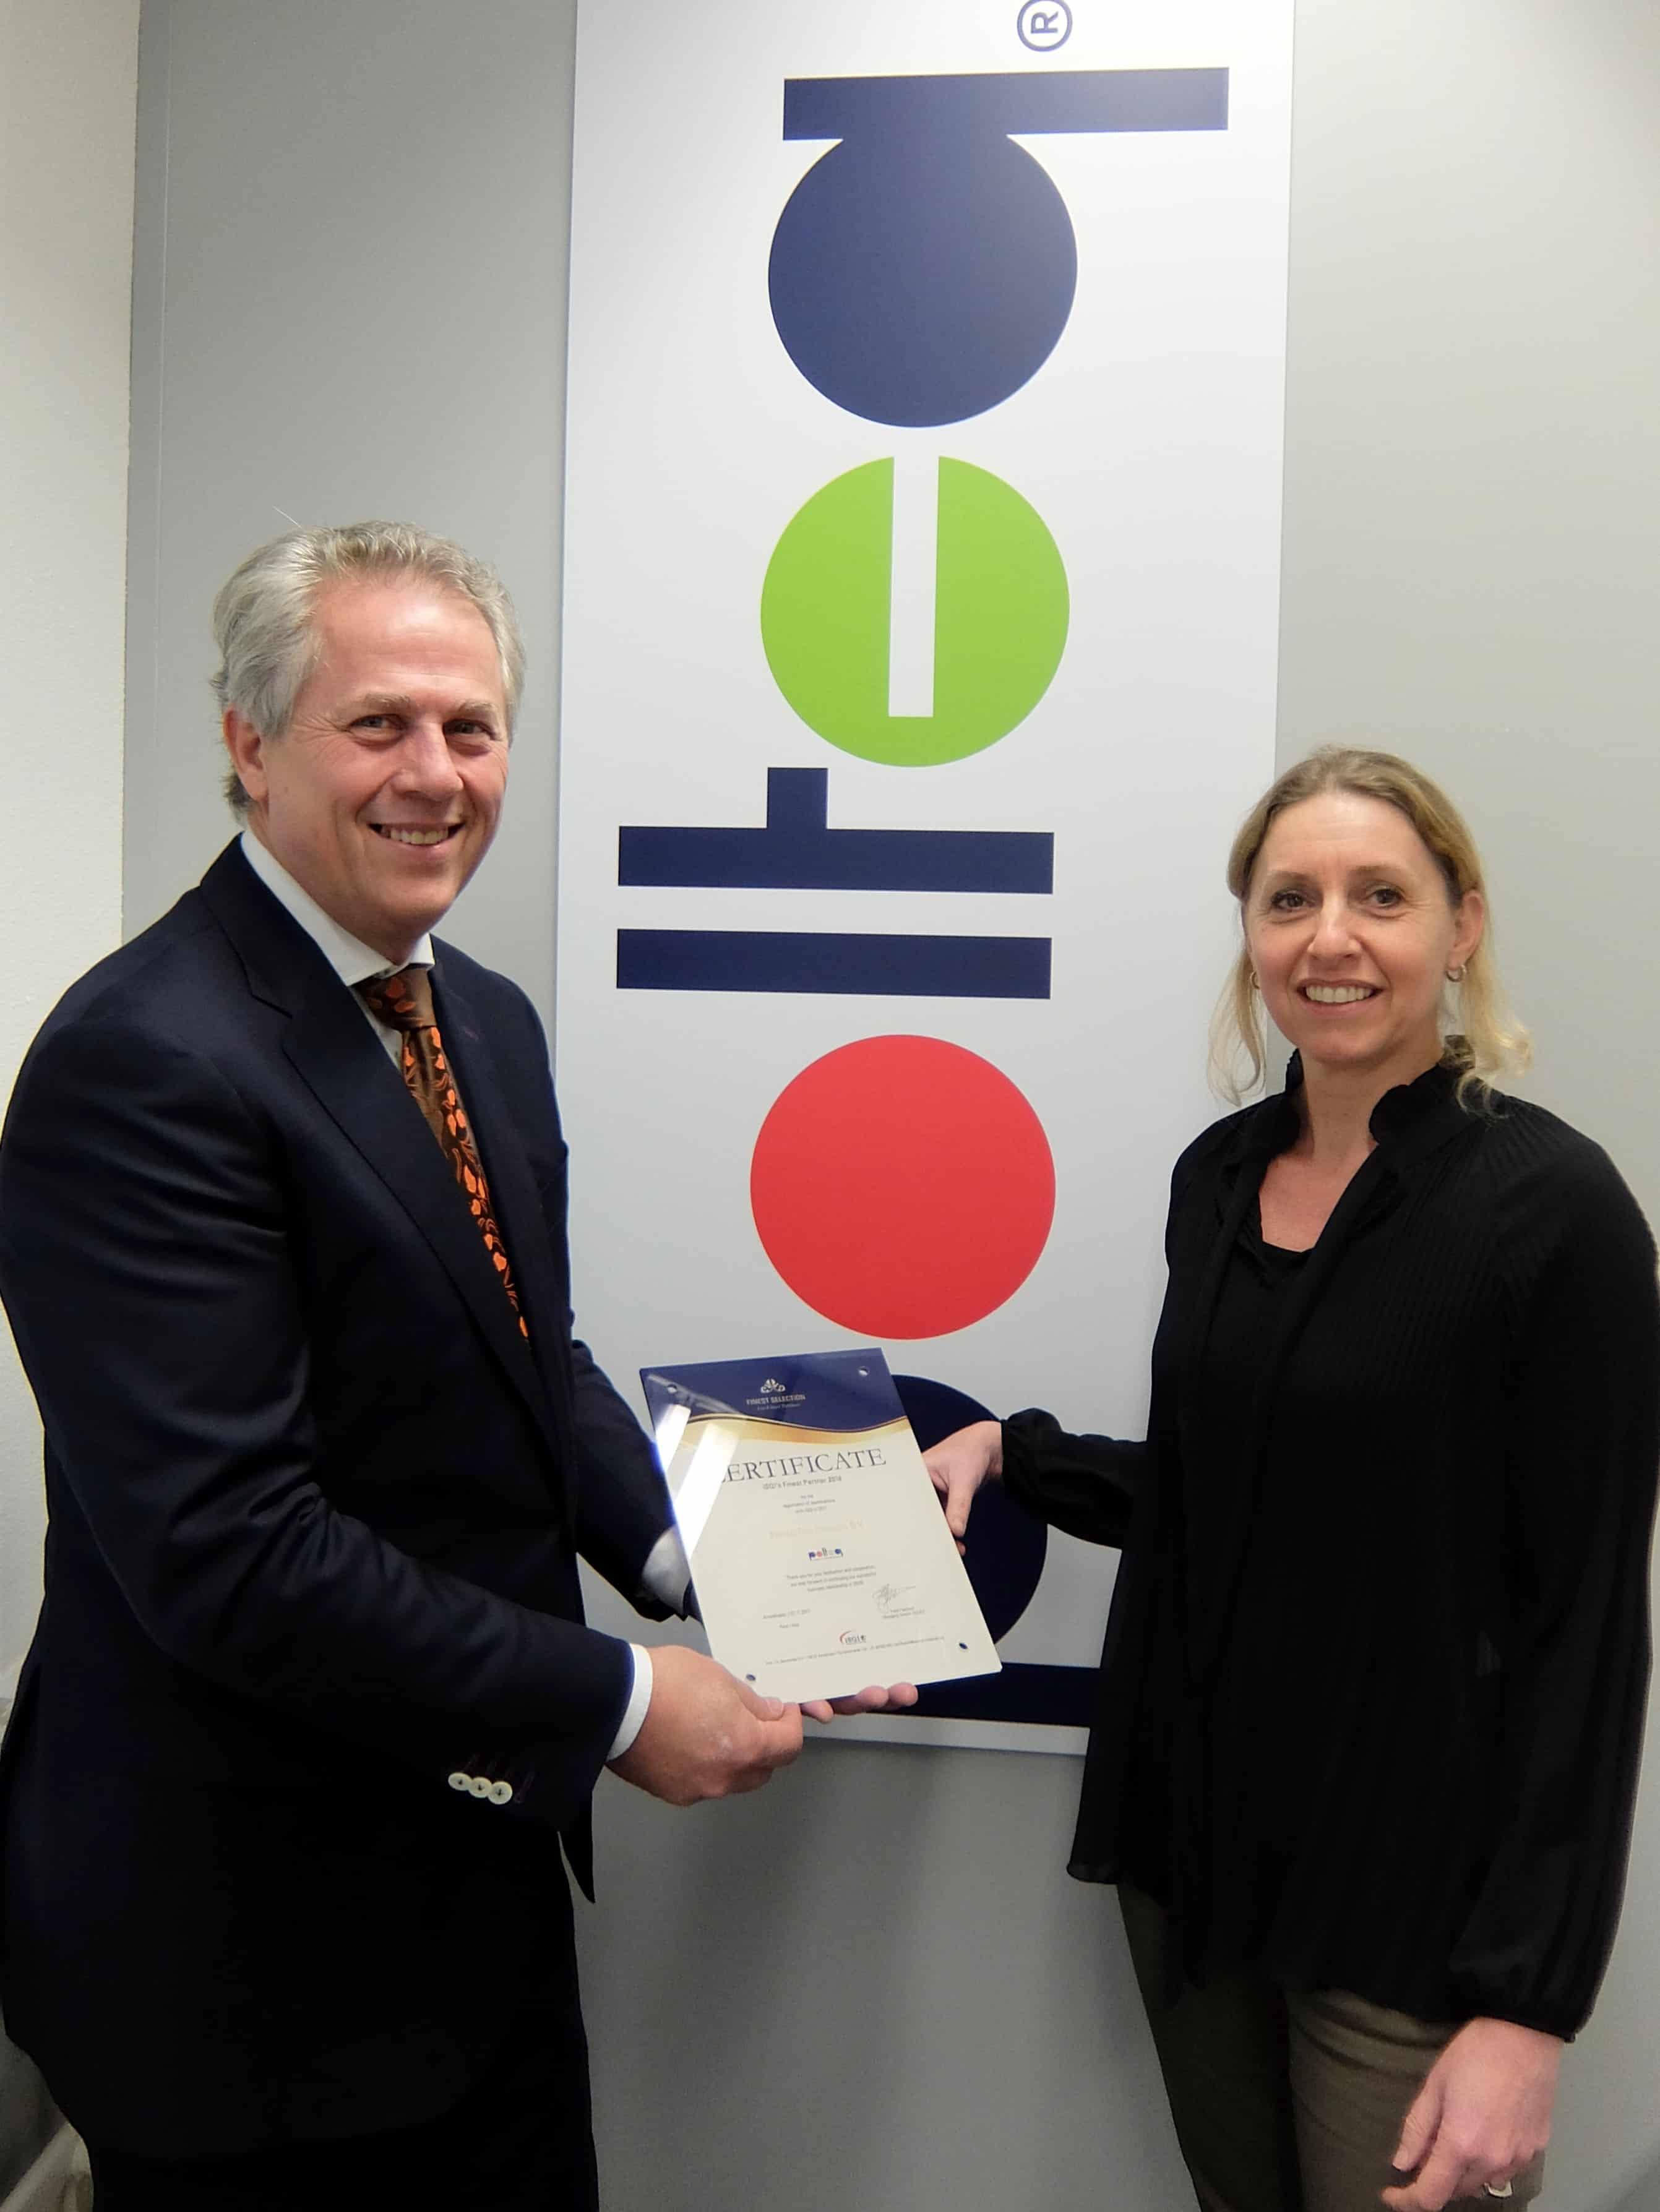 Frank Frambach, Managing director iSQI Netherlands, overhandigt de award aan Anja Bakker, Manager Opleidingen van Polteq.